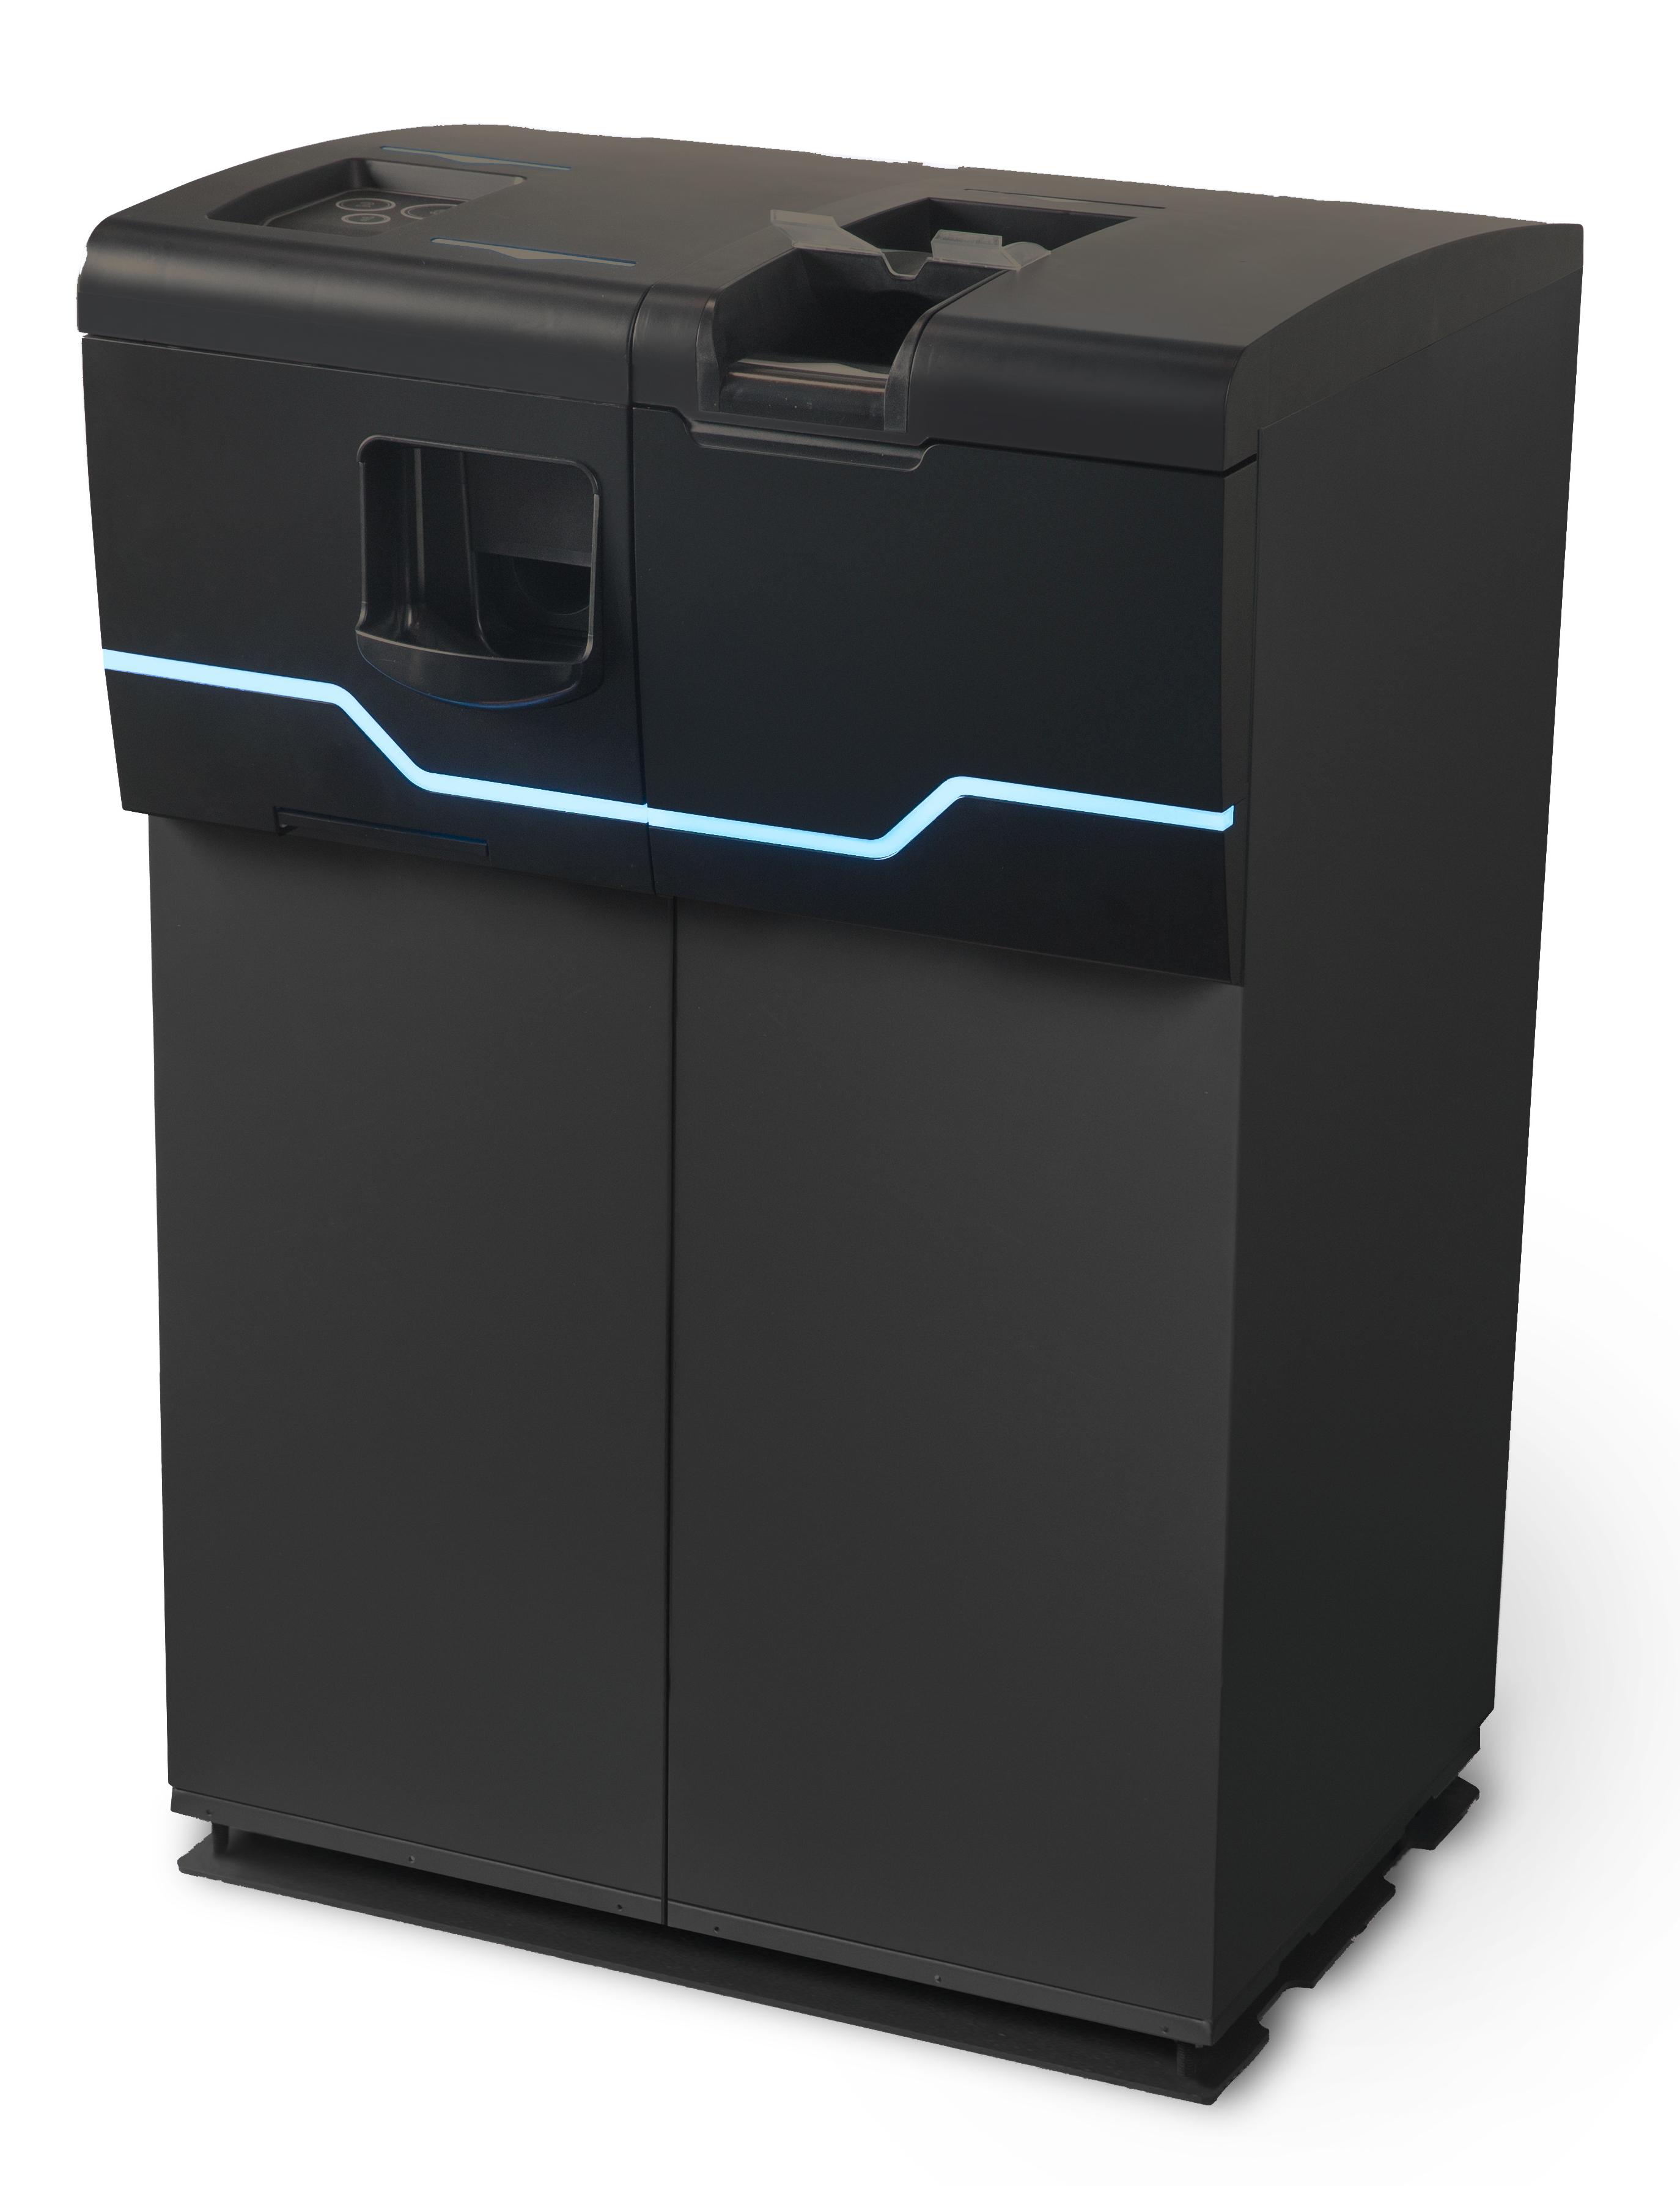 SuzoHapp SPS-700/800 Smart POS Solution